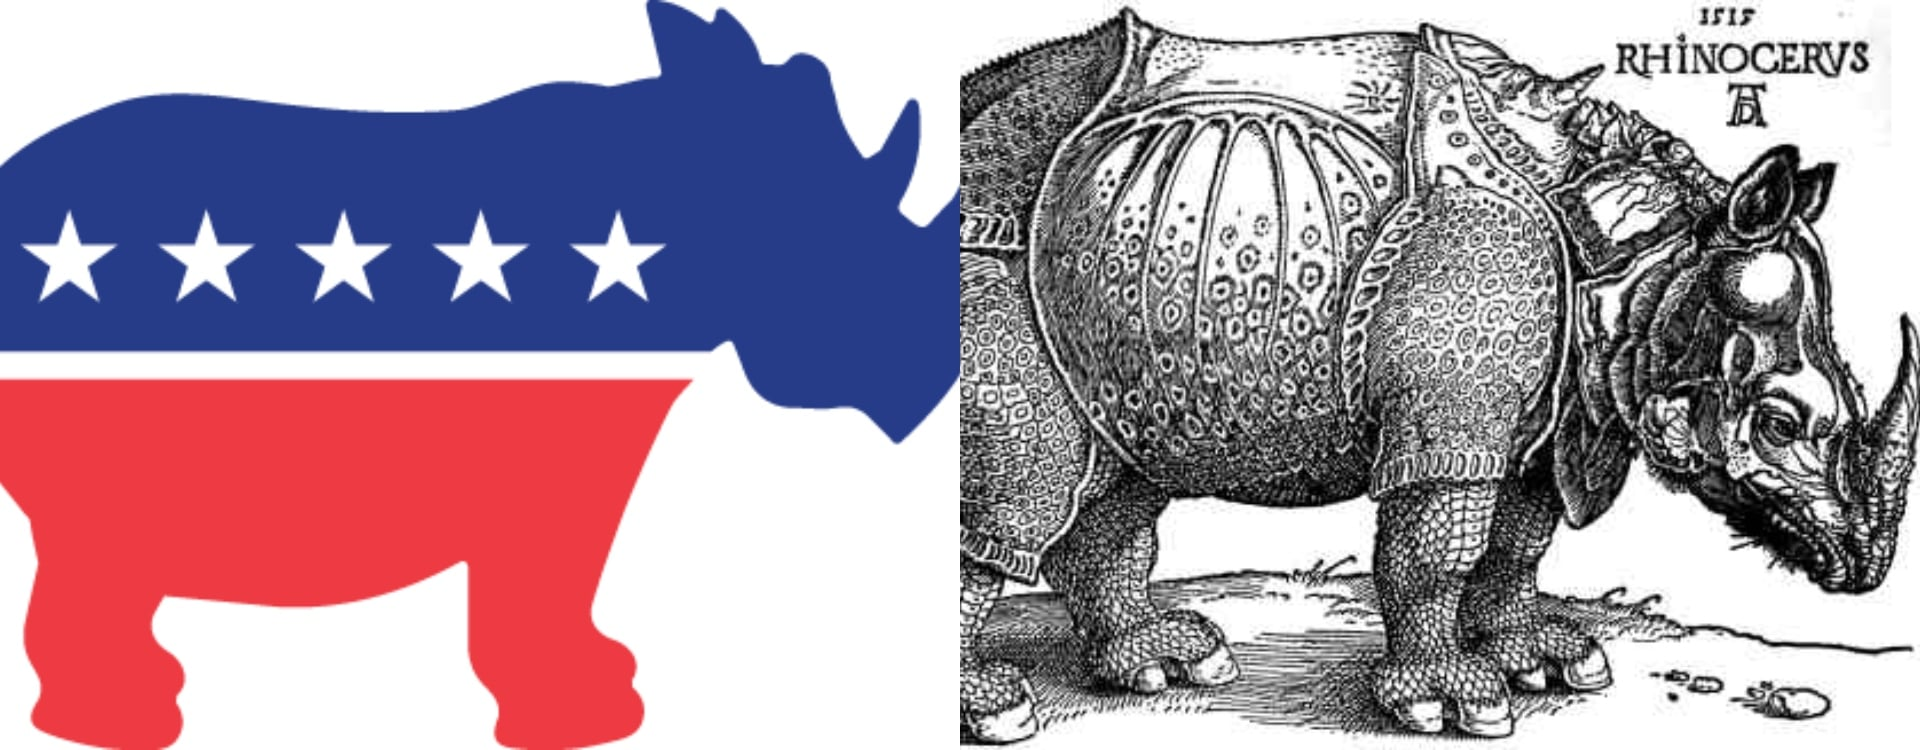 Rhinoceros Party of Canada